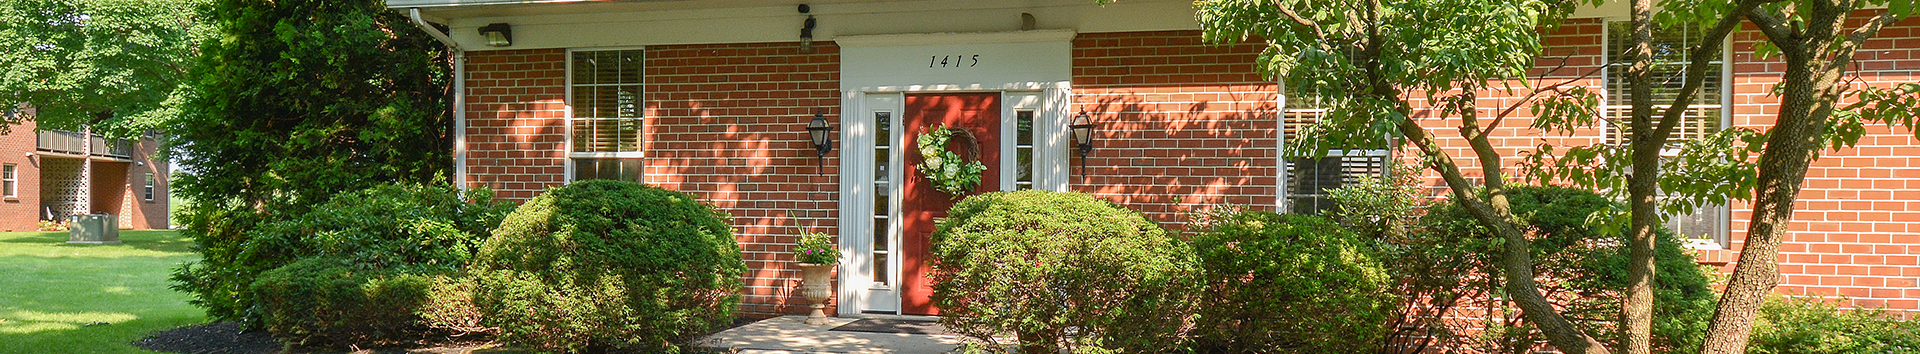 About Manor Communities, Lancaster/Pennsylvania